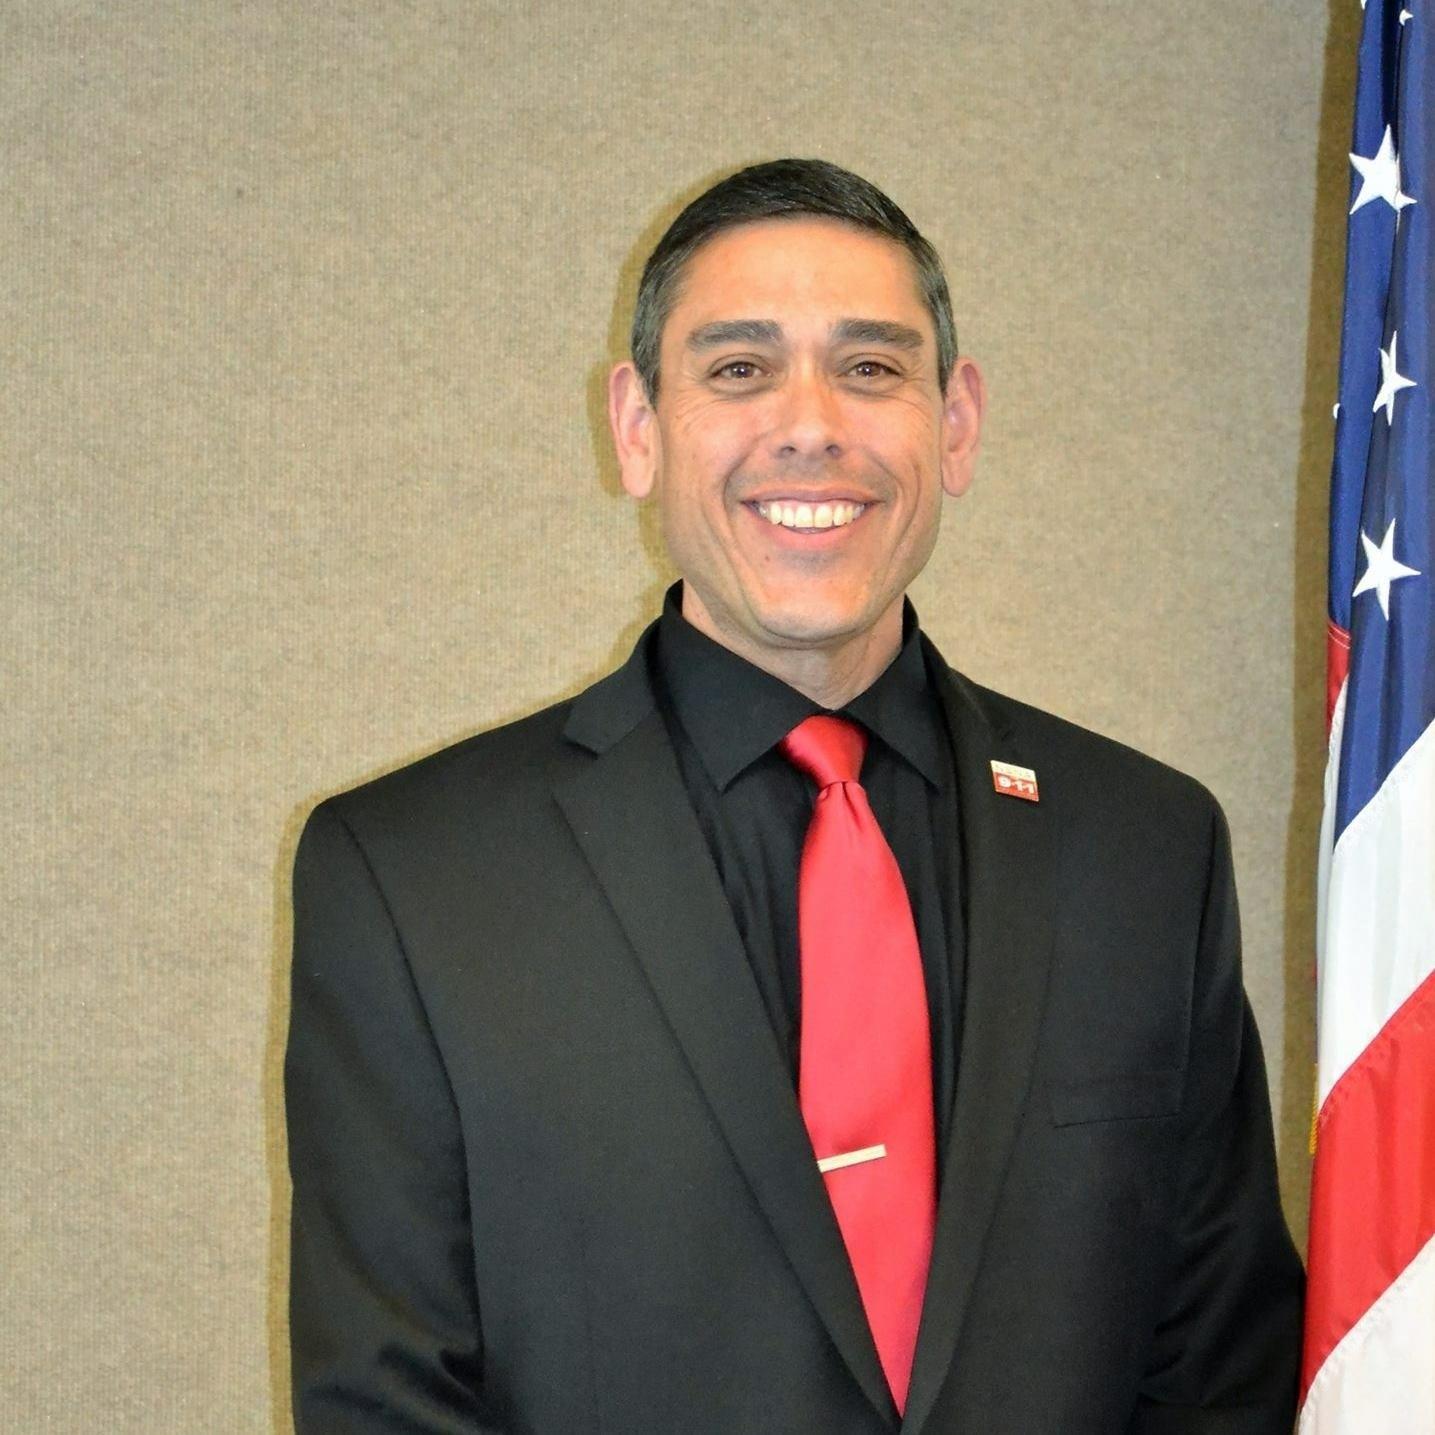 Bruce Romero - Executive Director